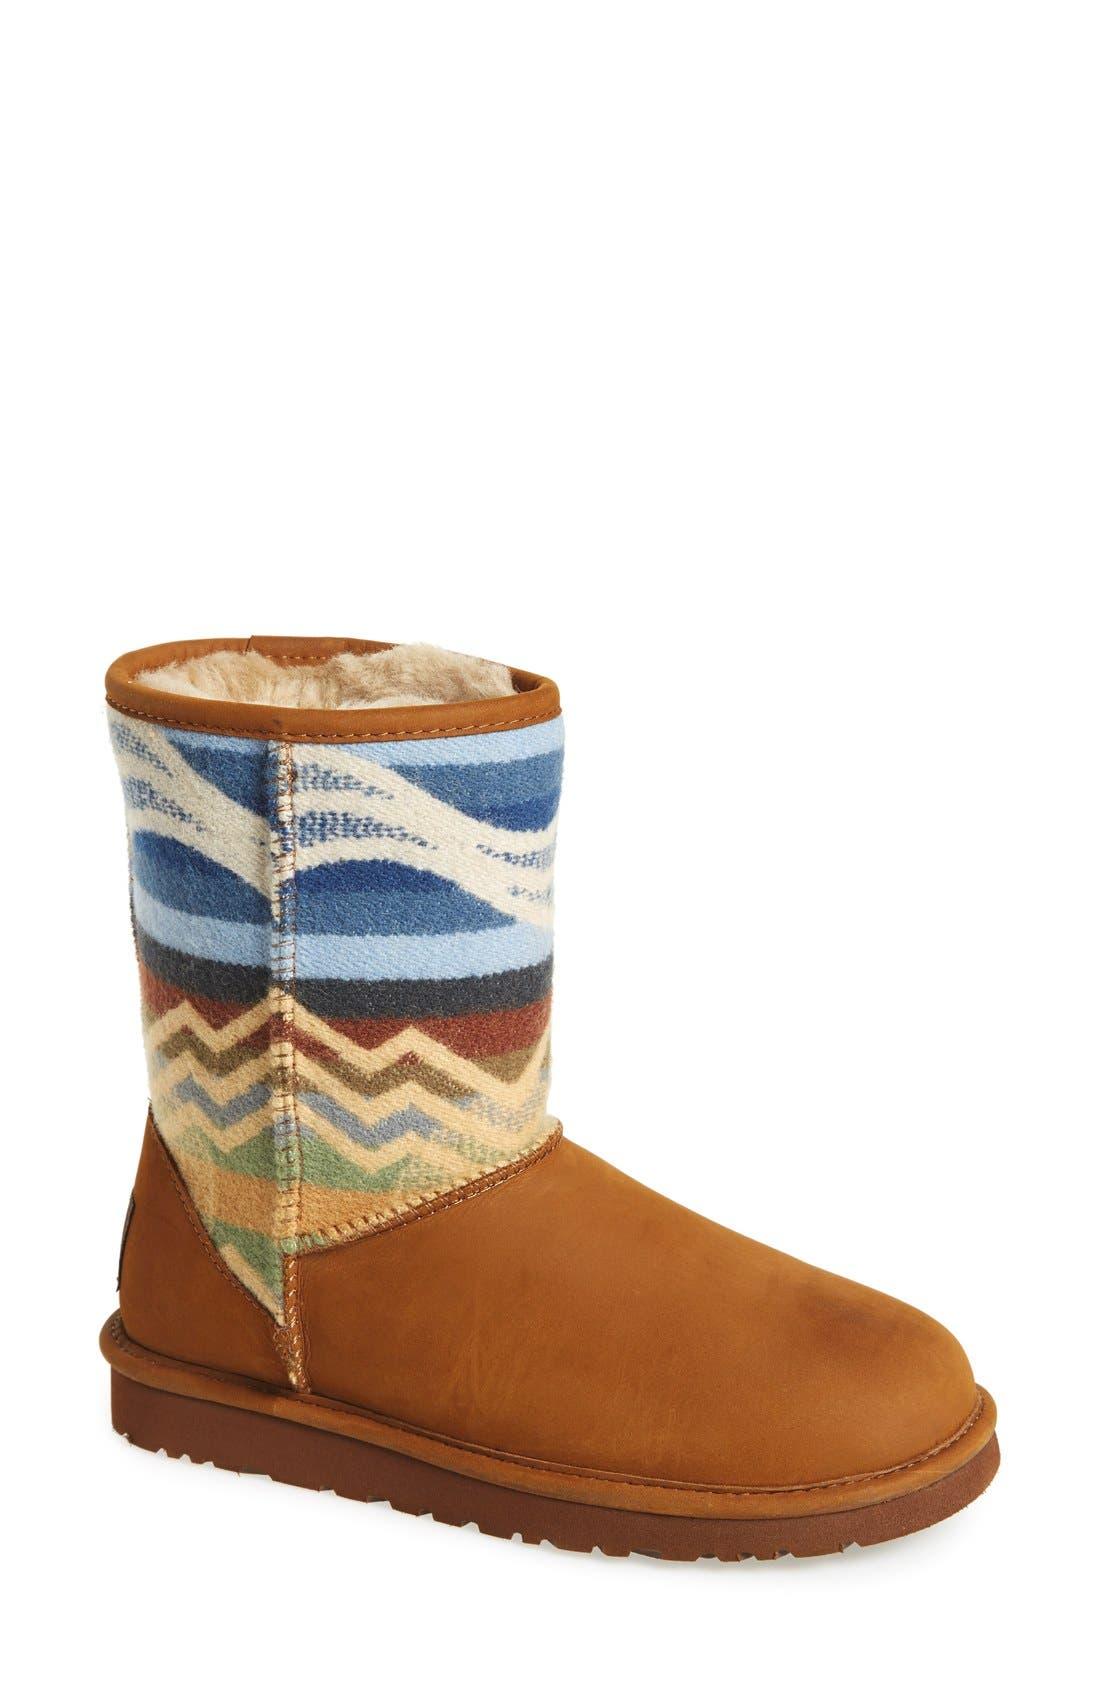 Main Image - UGG® 'Classic ShortPendleton'Boot (Women)